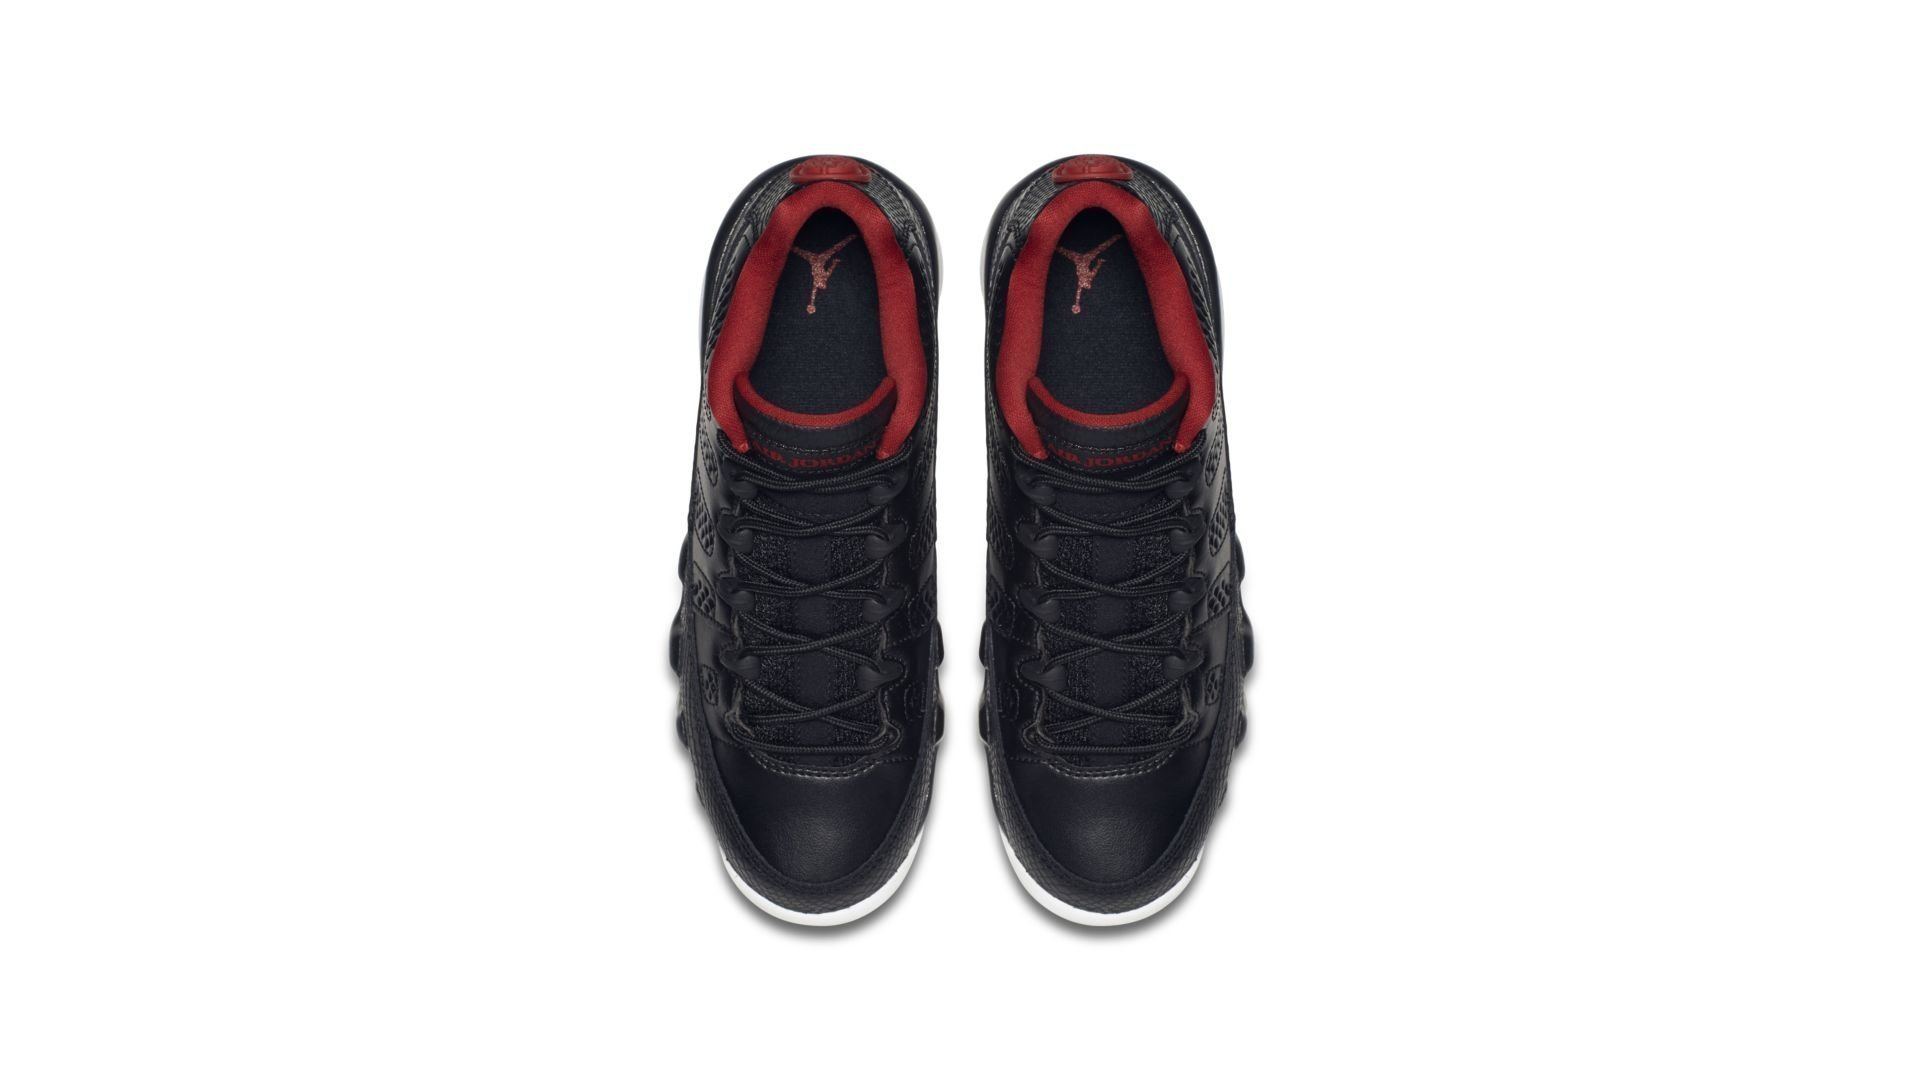 Jordan 9 Retro Low Snakeskin (GS) (833447-001)